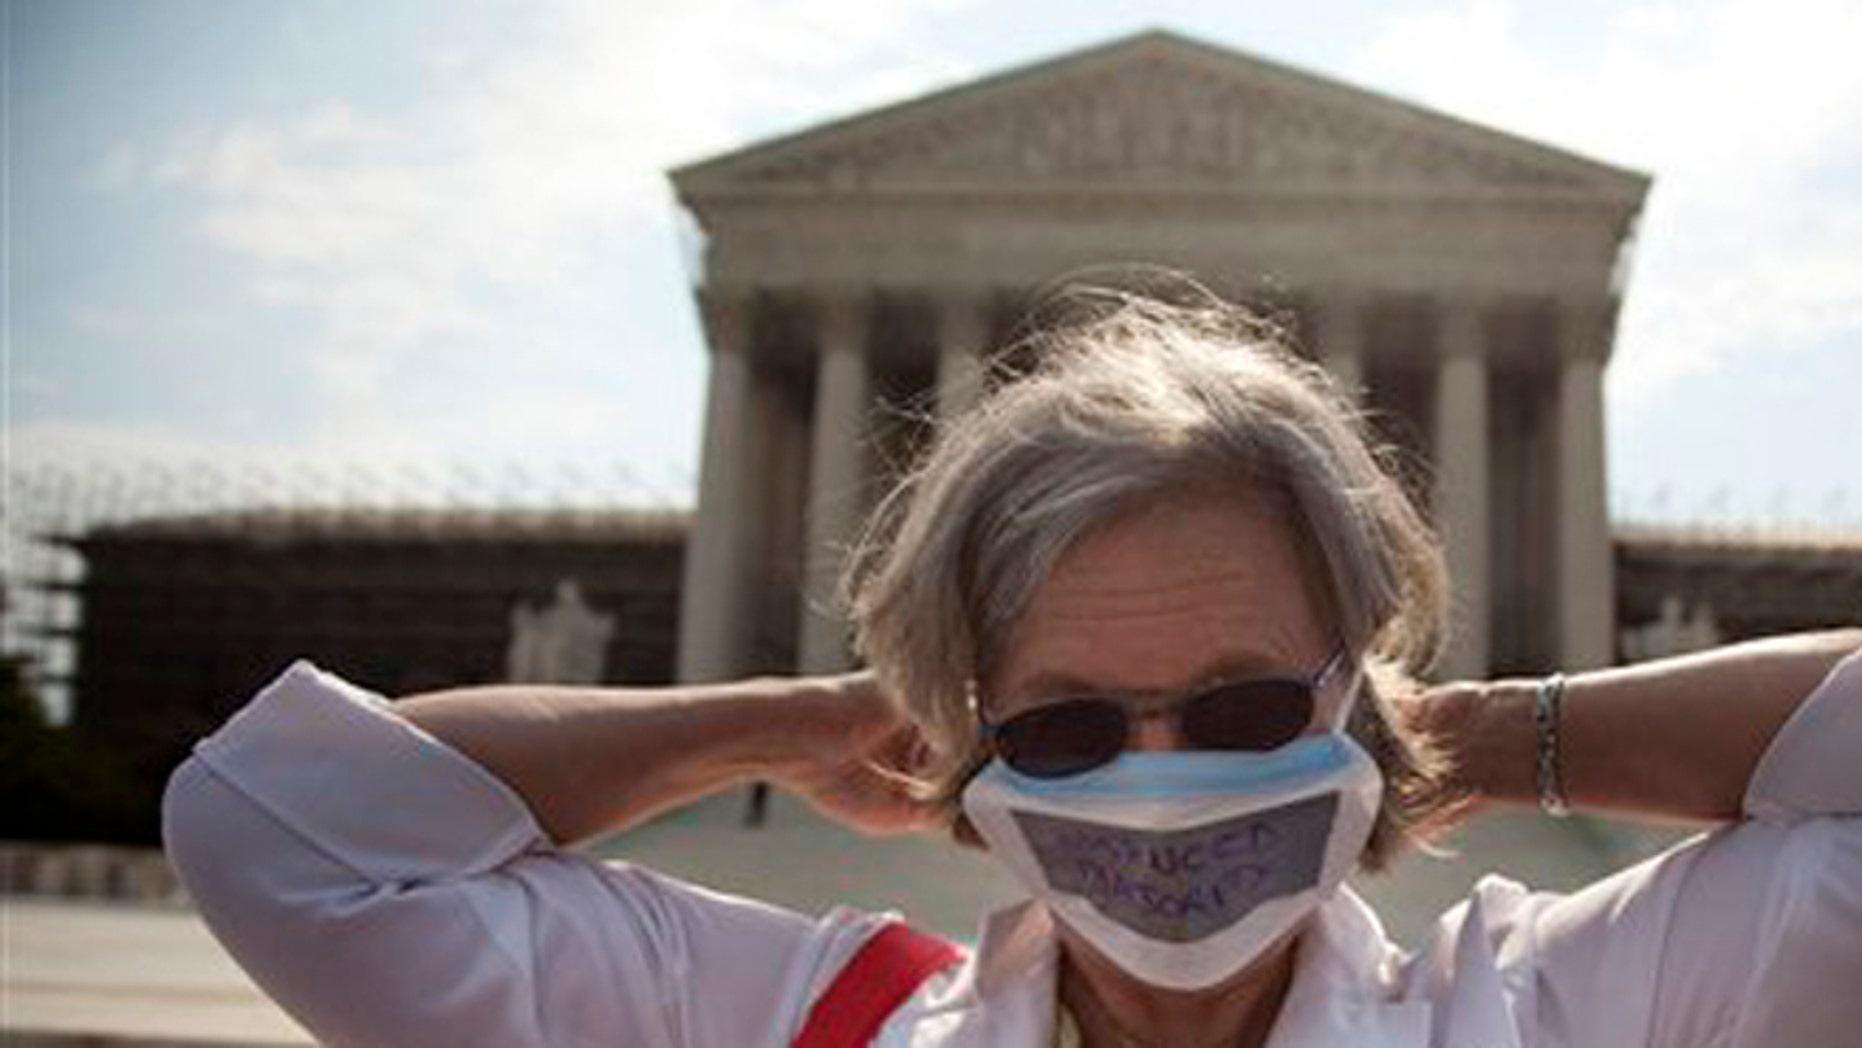 June 25, 2012: Carol Paris of Leonardtown, Md. demonstrates outside the Supreme Court in Washington.